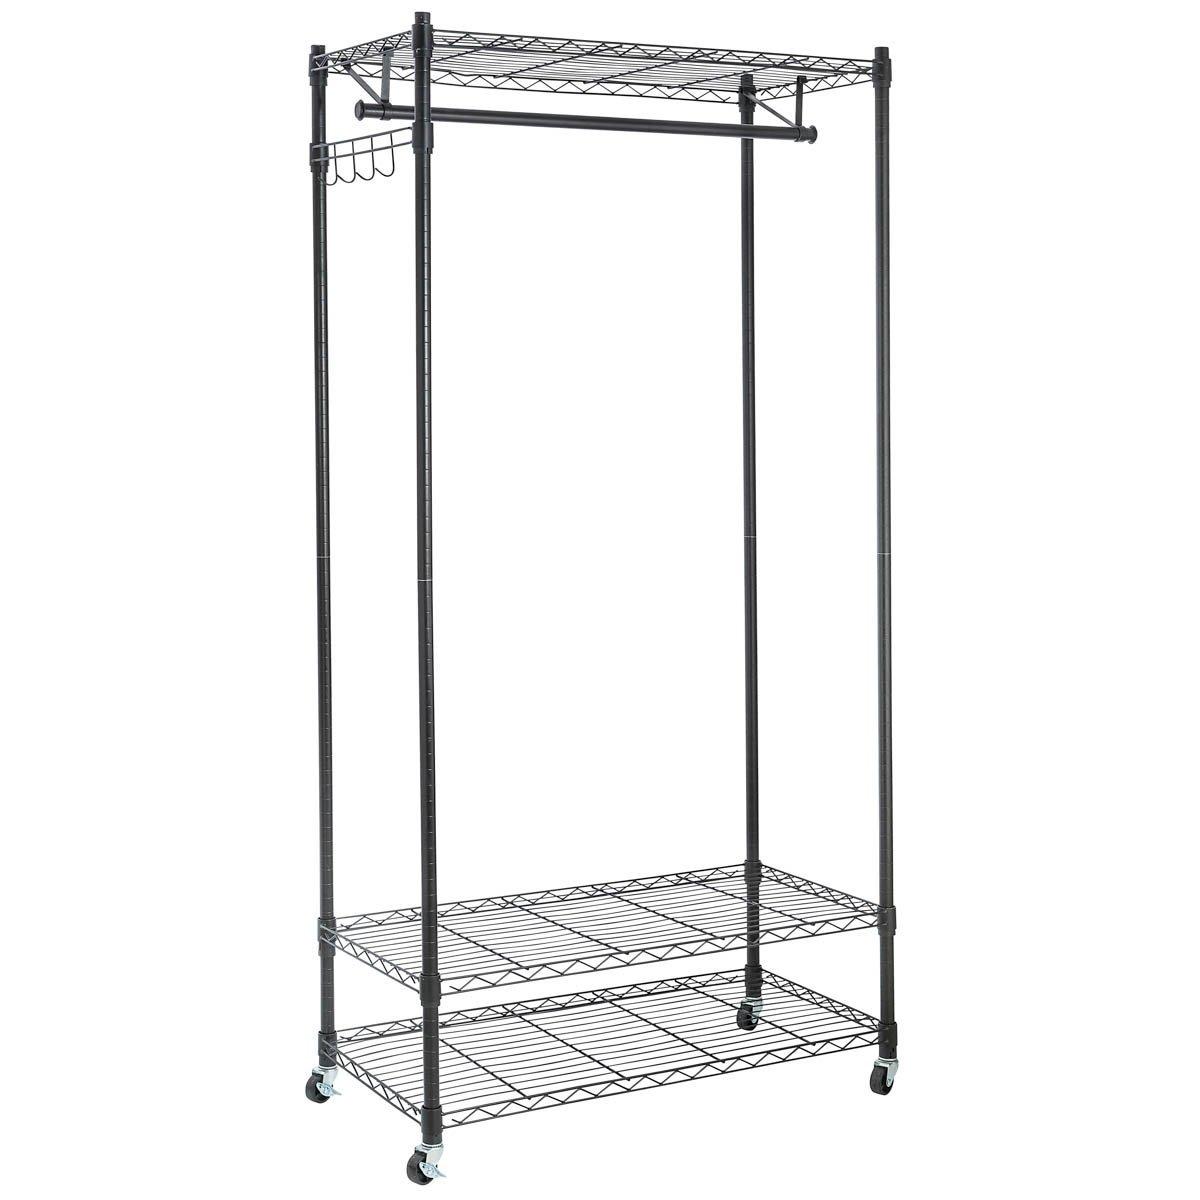 Amazon.com: Home-it Wire Shelving Garment Rack on Wheels - Black ...